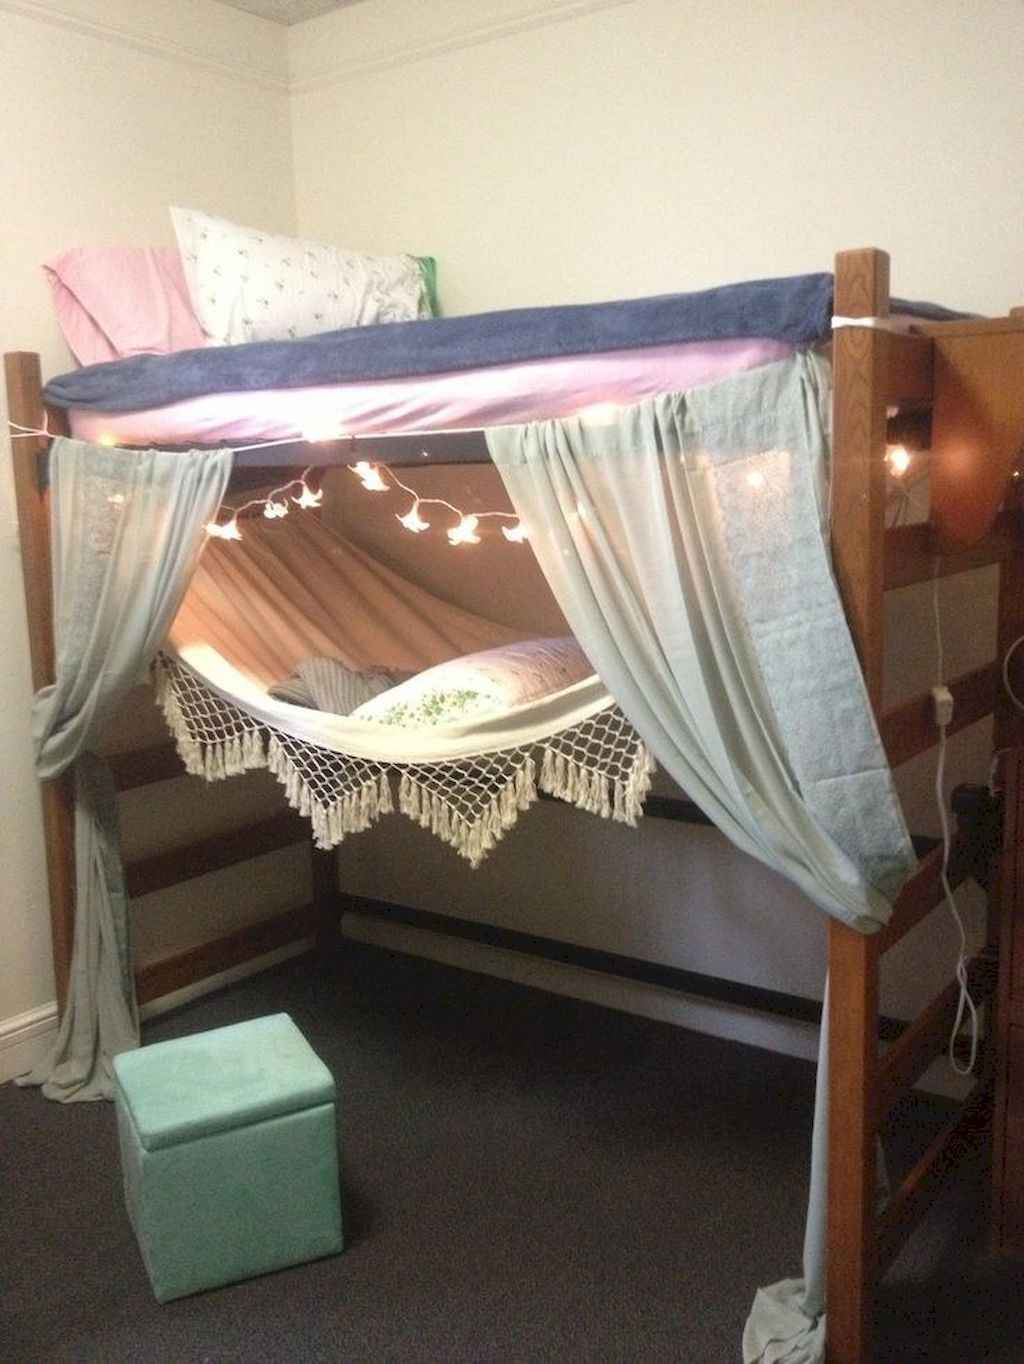 Cute diy dorm room decorating ideas on a budget (20)